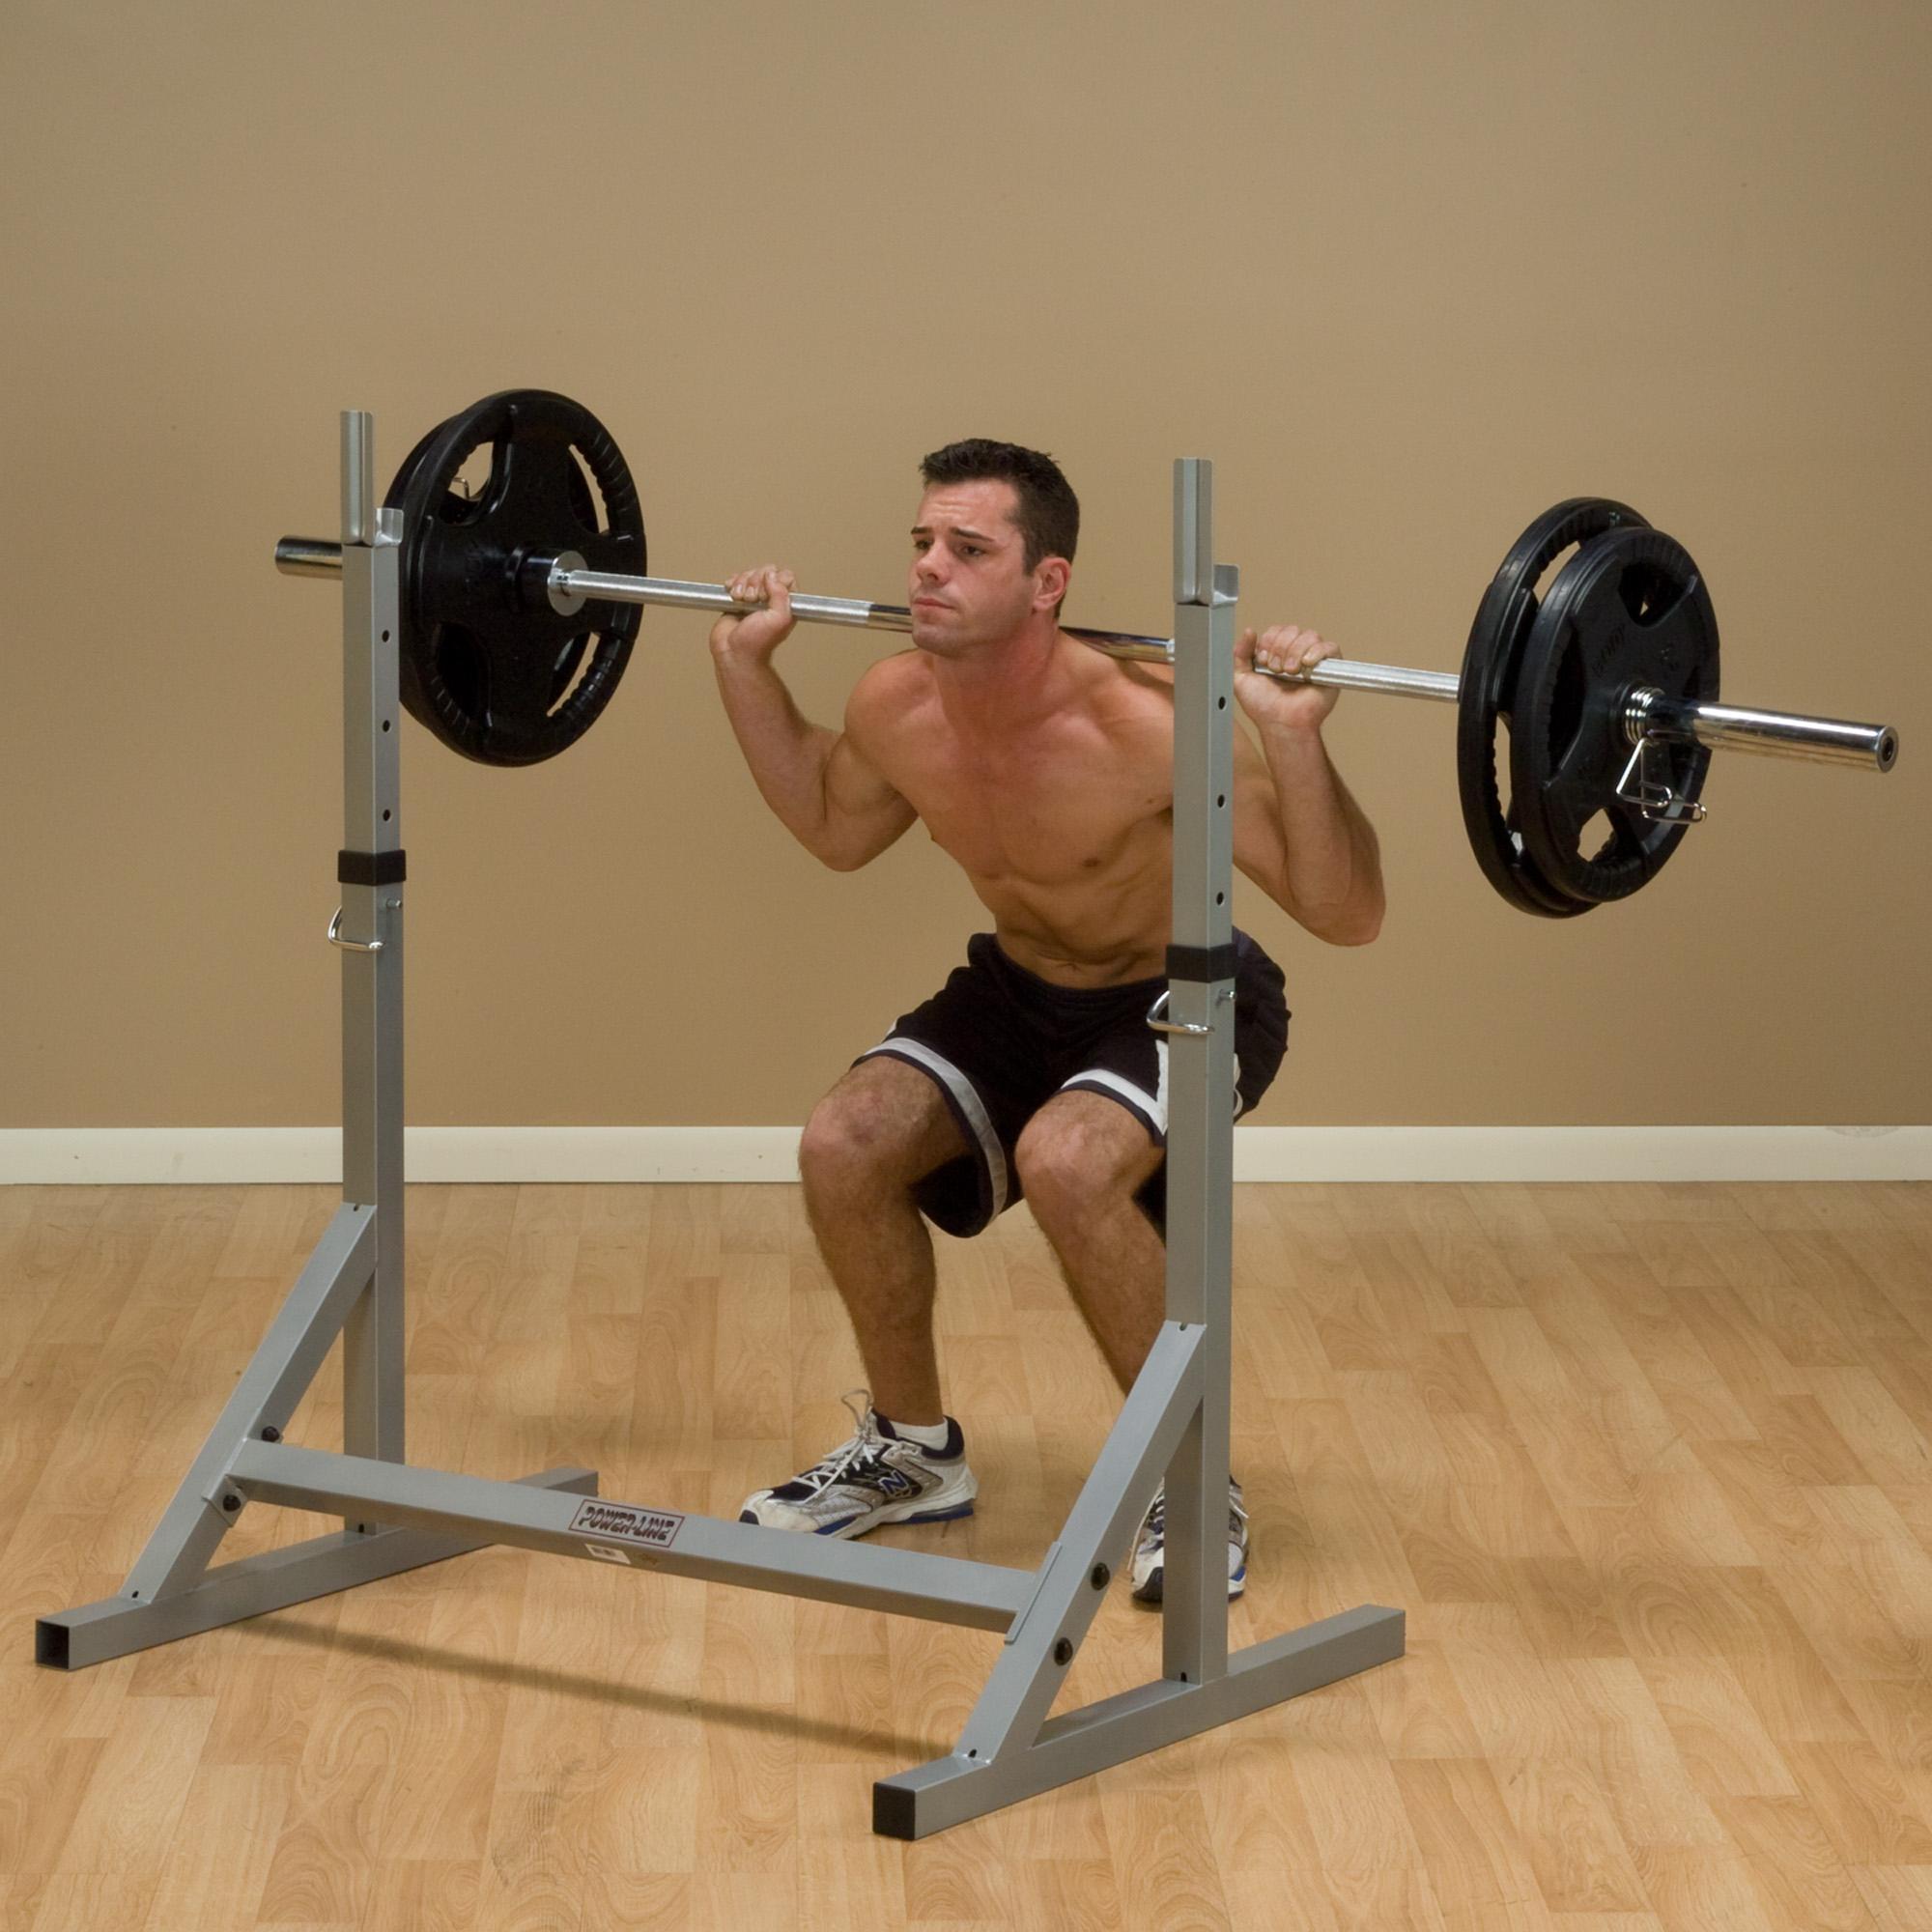 Bowflex Revolution Folded Up Dimensions: PowerLine PSS60X Squat Rack, Home Gyms